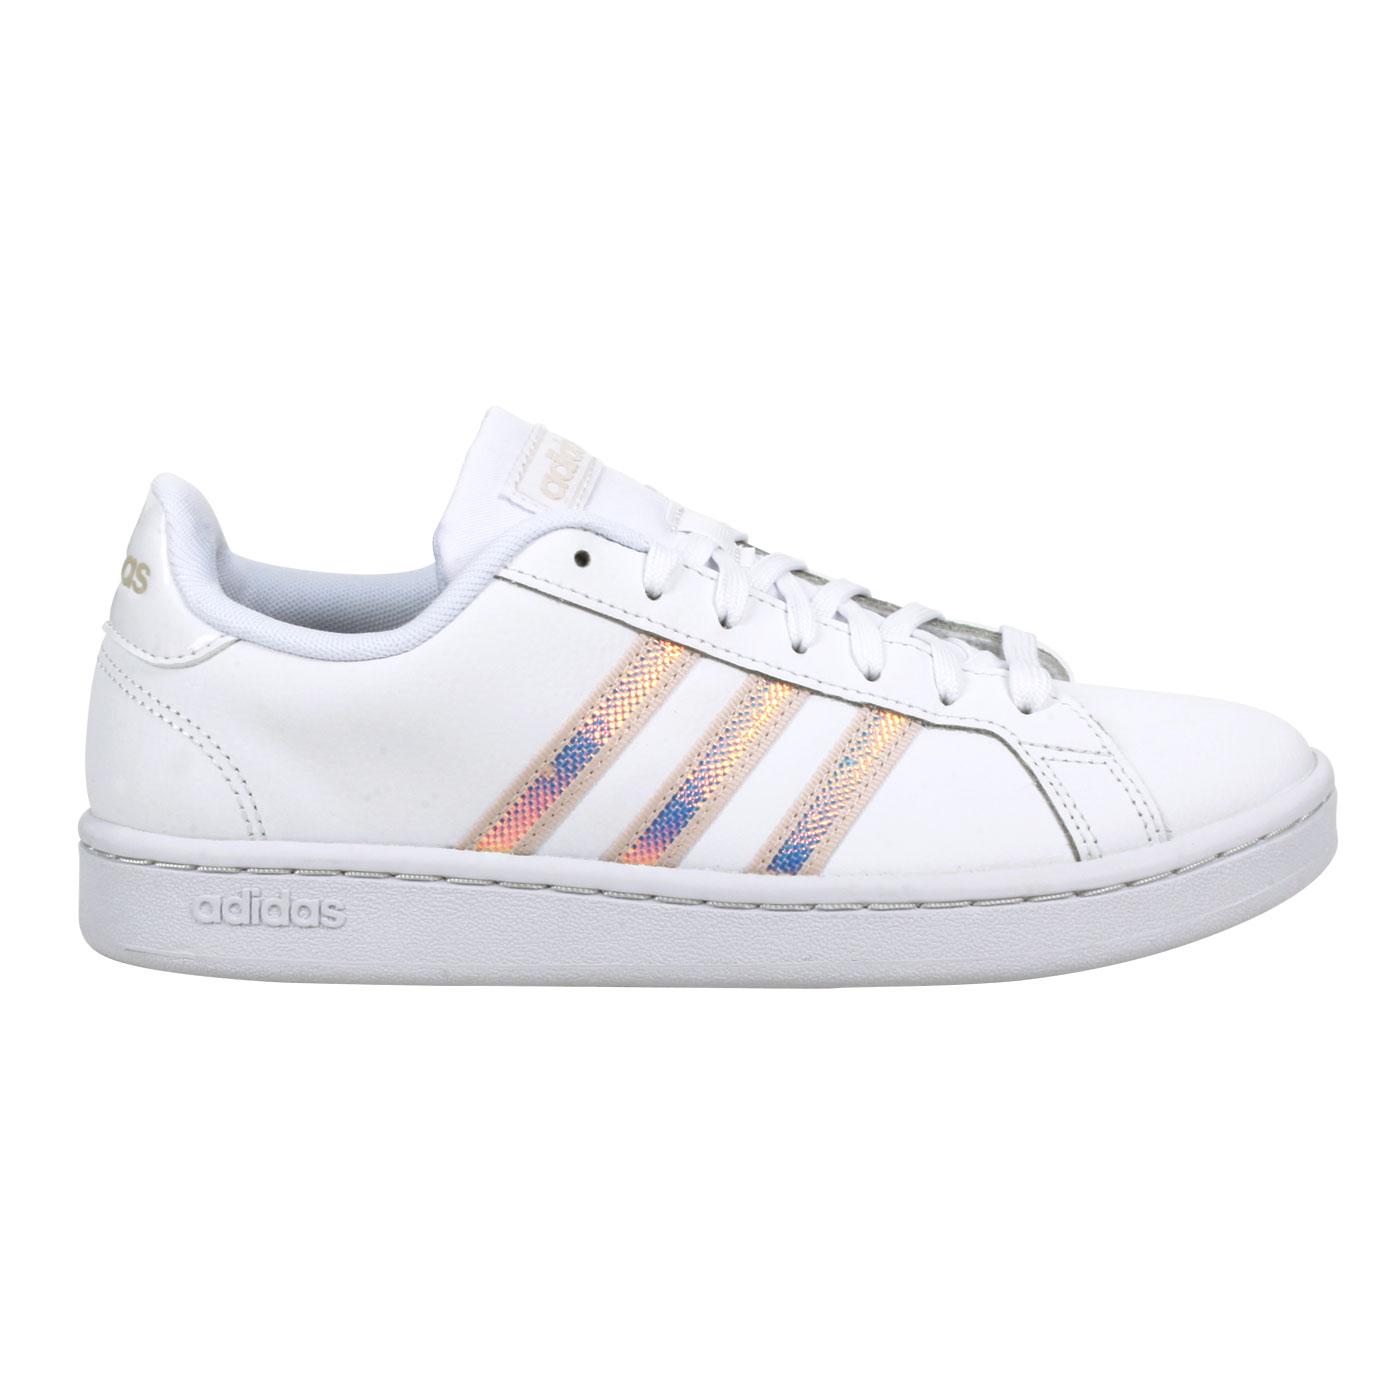 ADIDAS 女款休閒運動鞋 FW3734